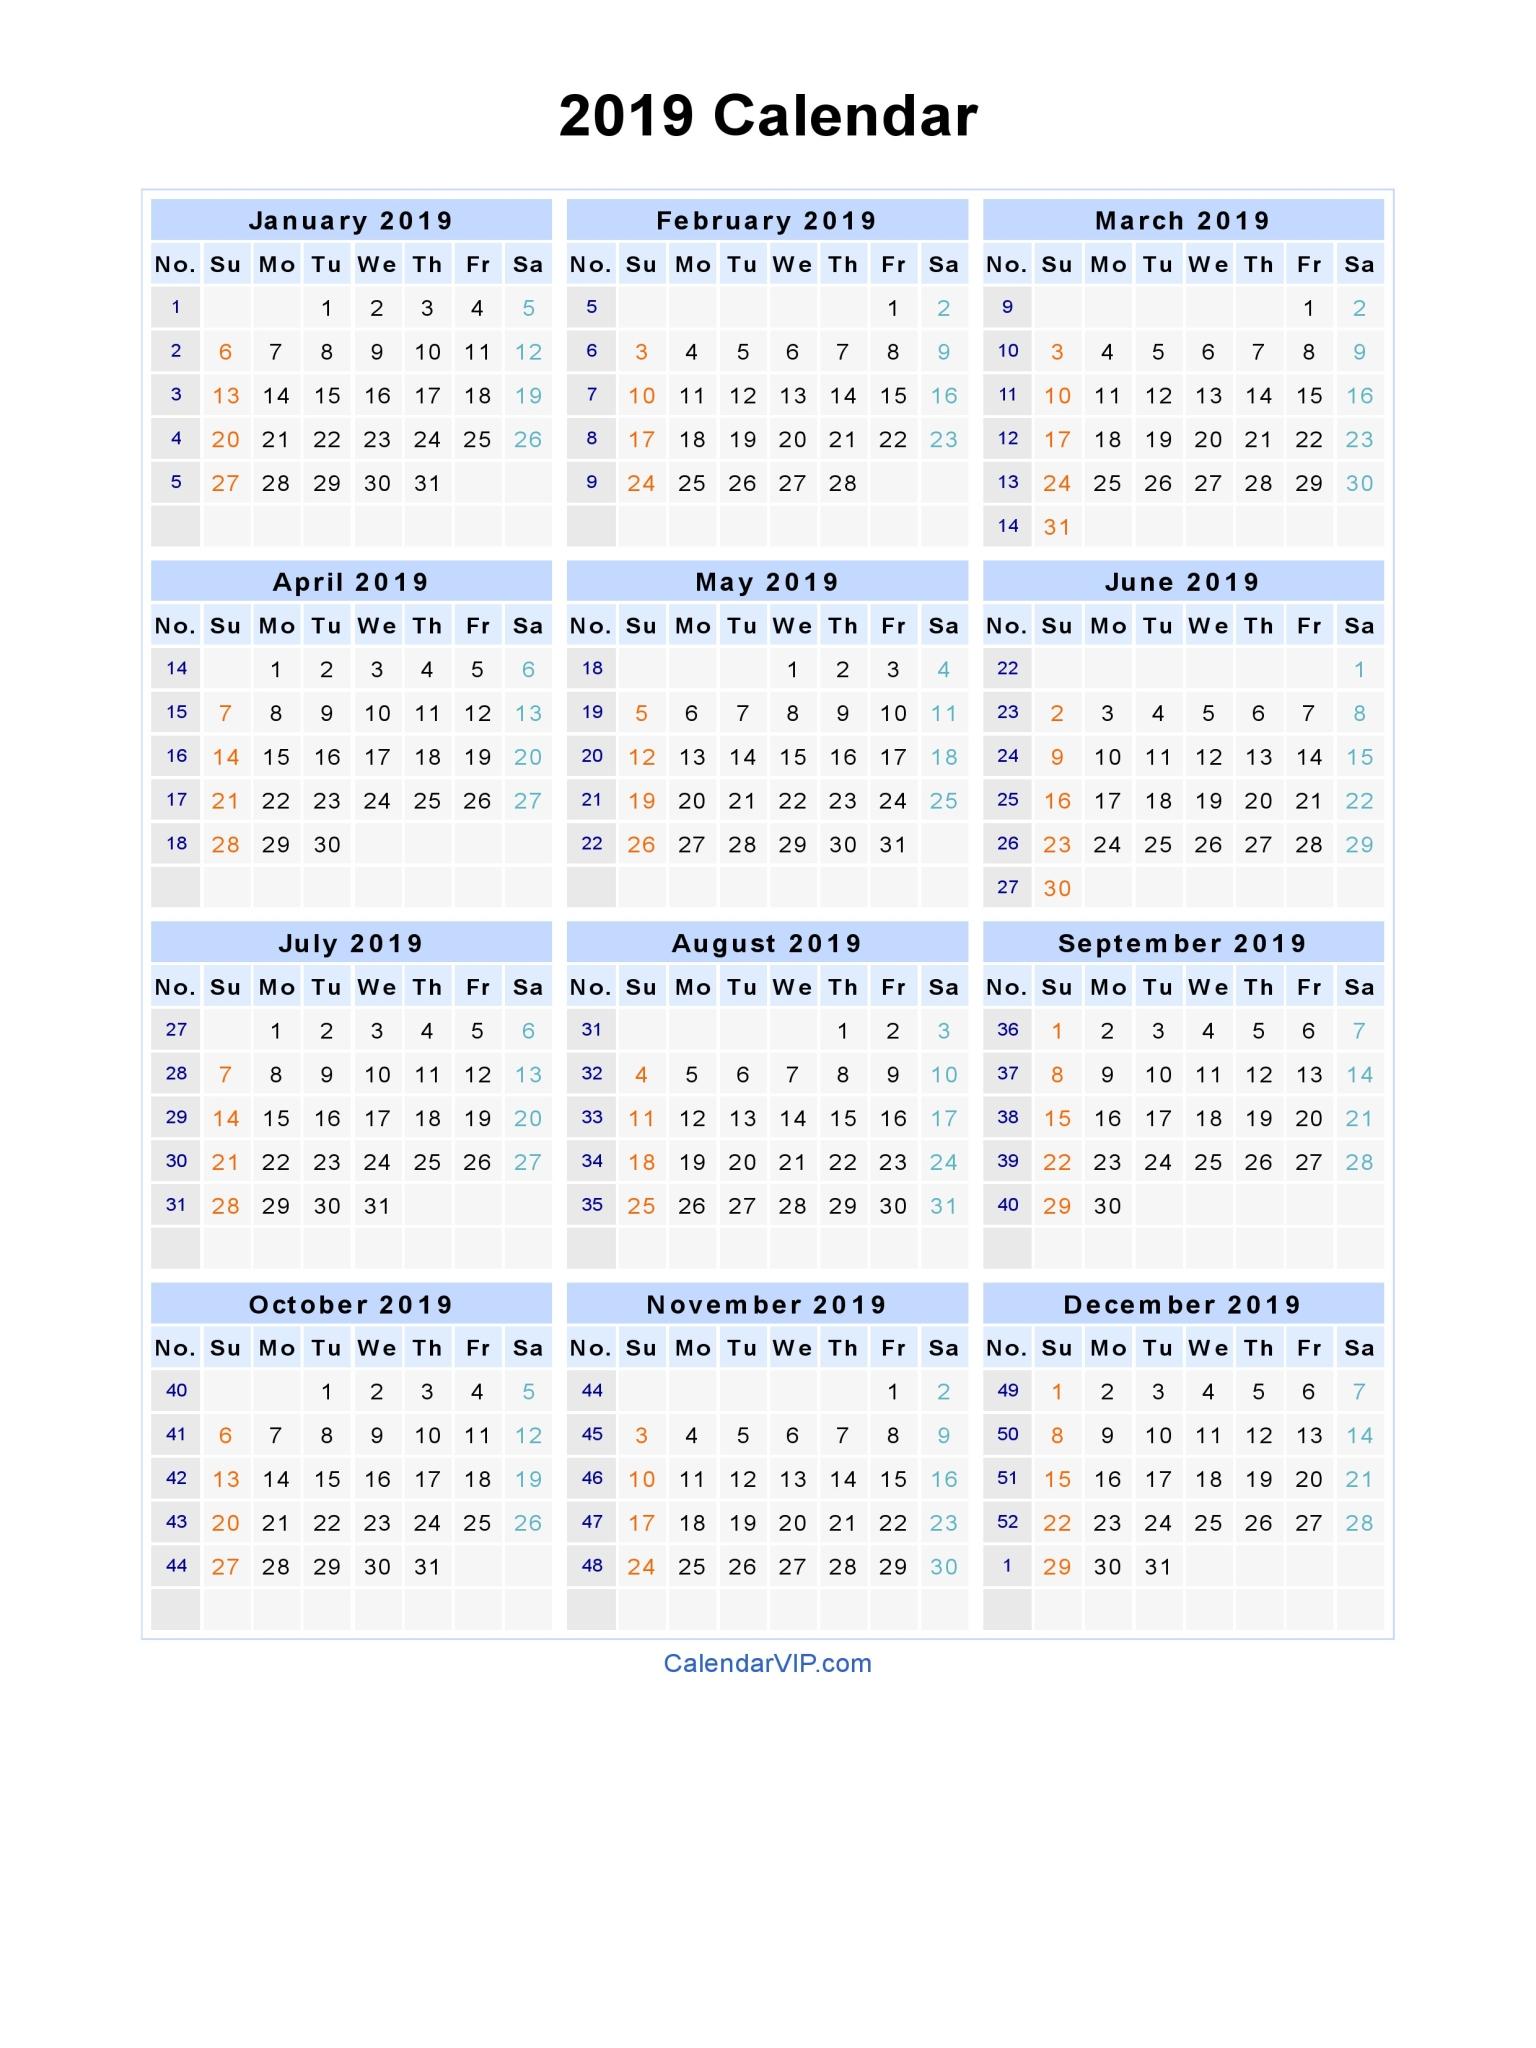 Calendar 2019 Ms Word - Erha.yasamayolver within 2019 2020 Ms Word Calendar